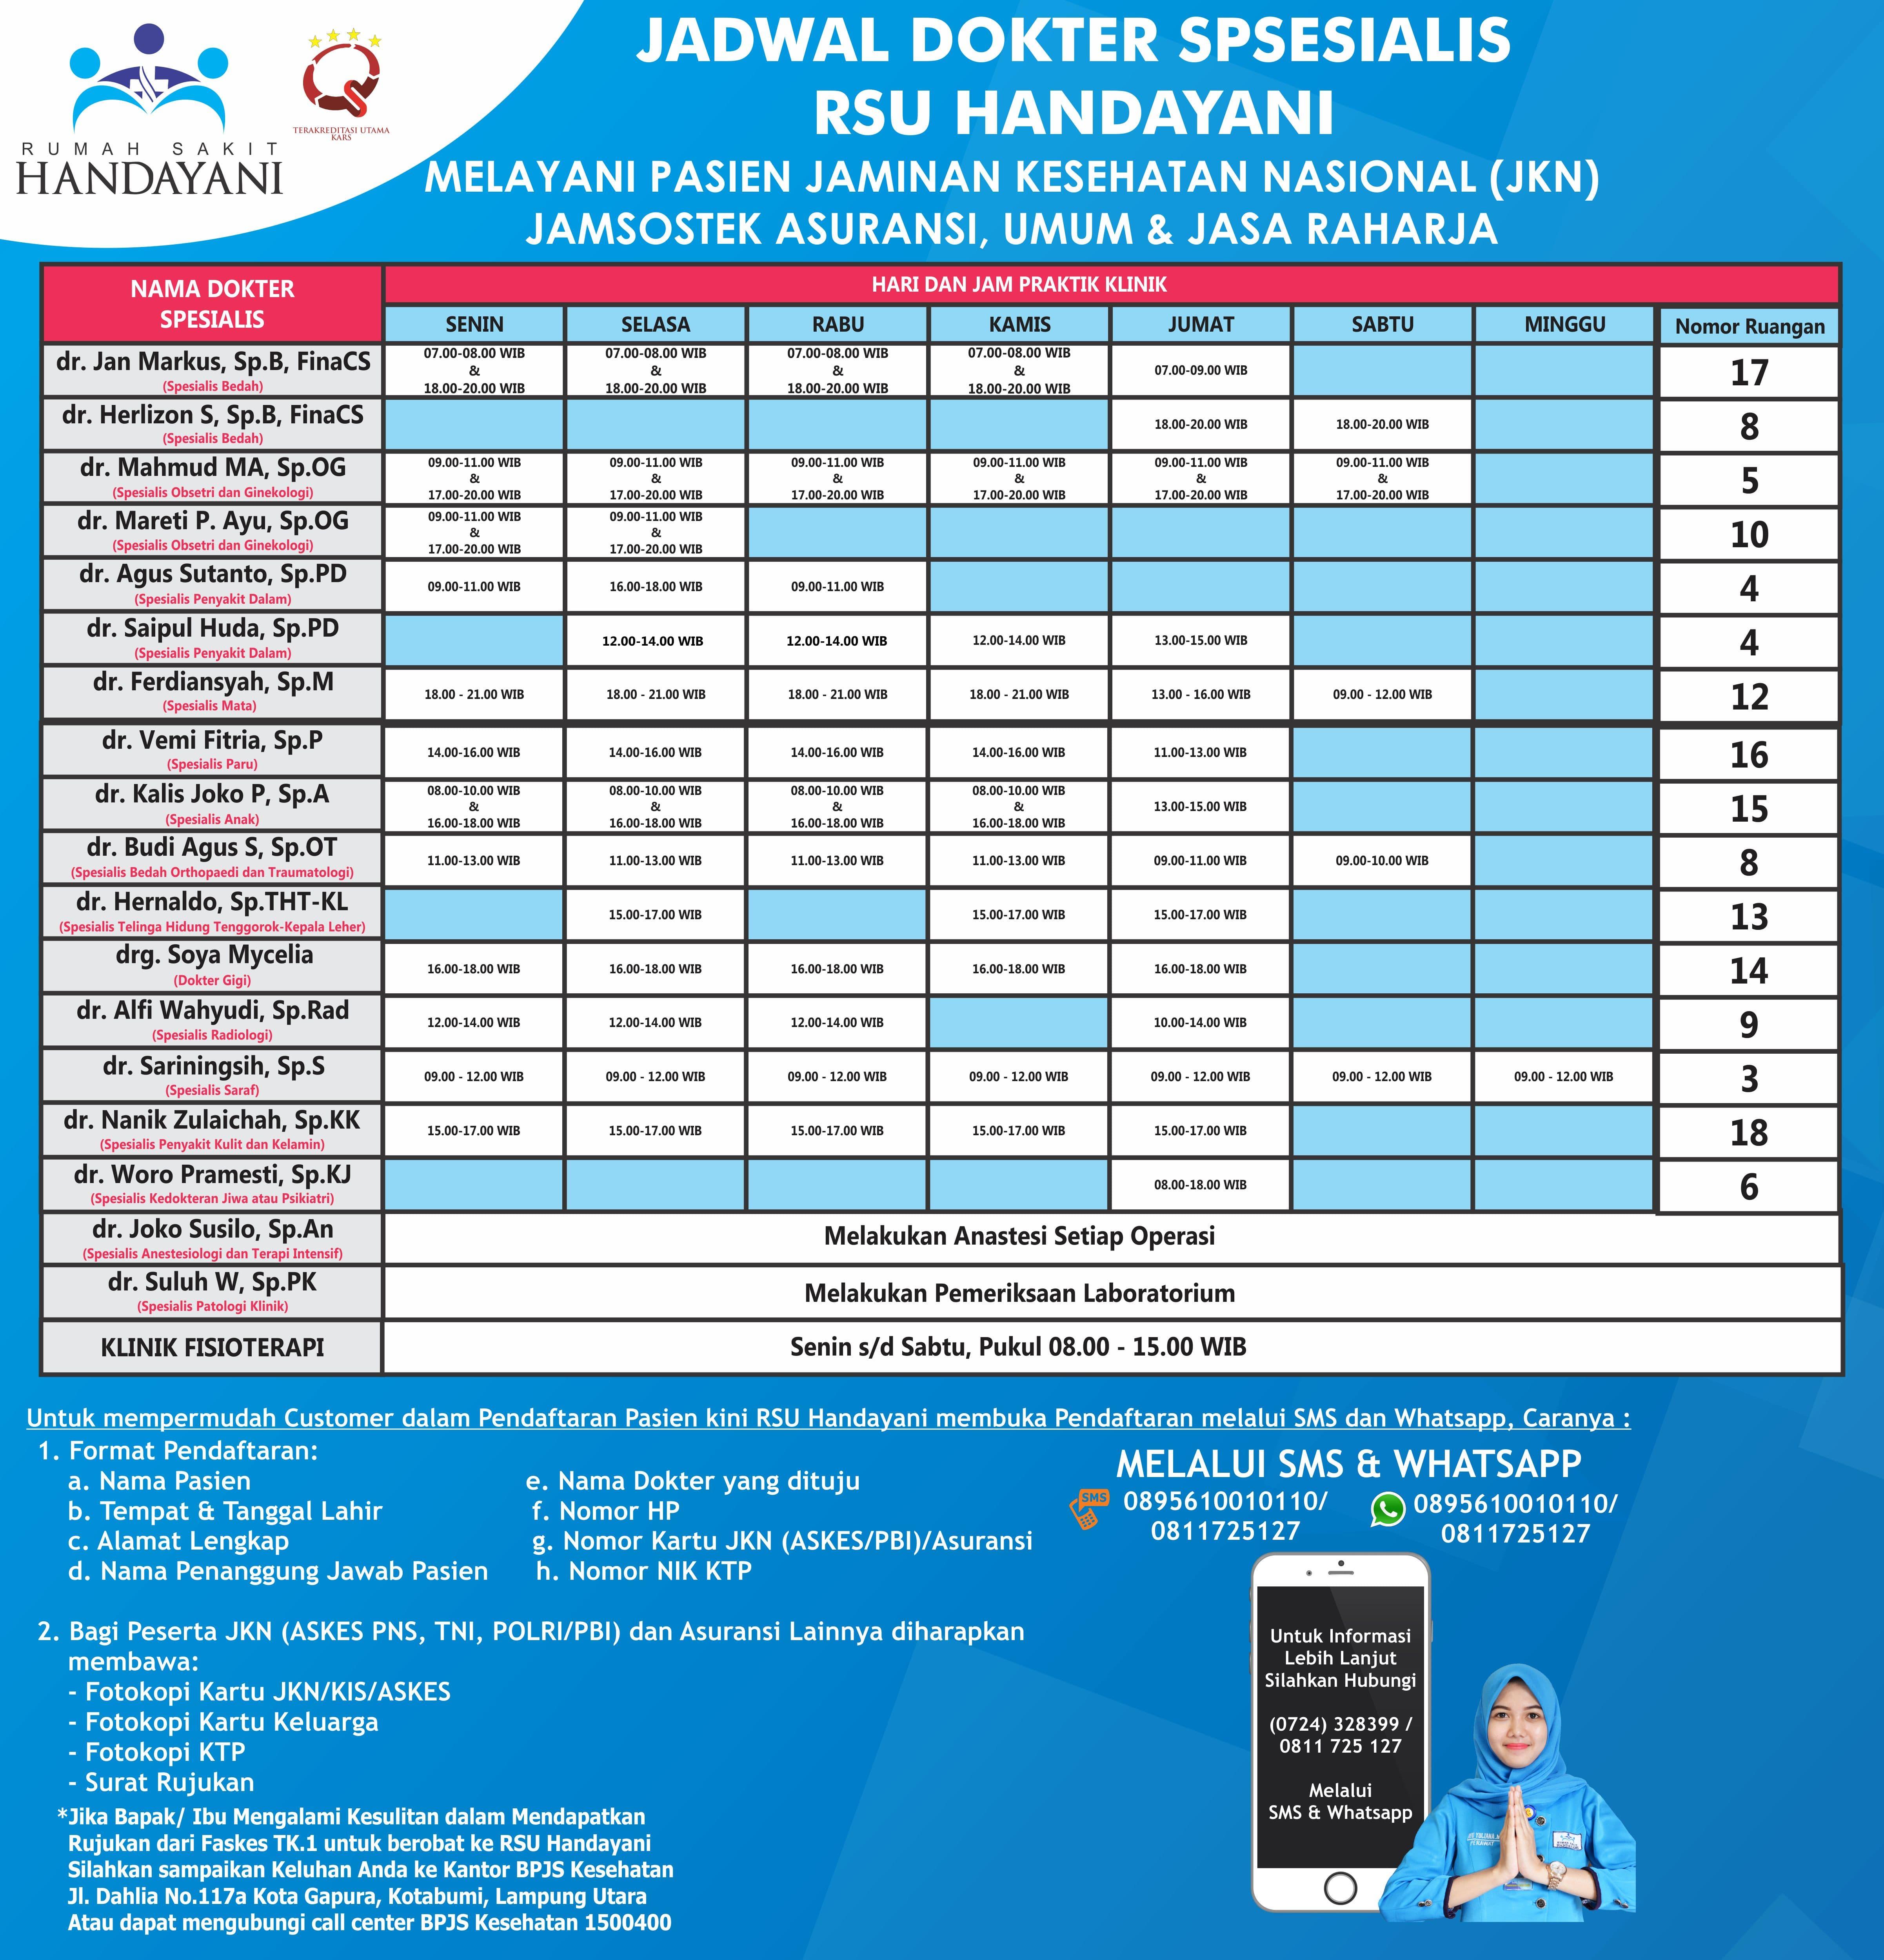 Jadwal Dokter RSU Handayani